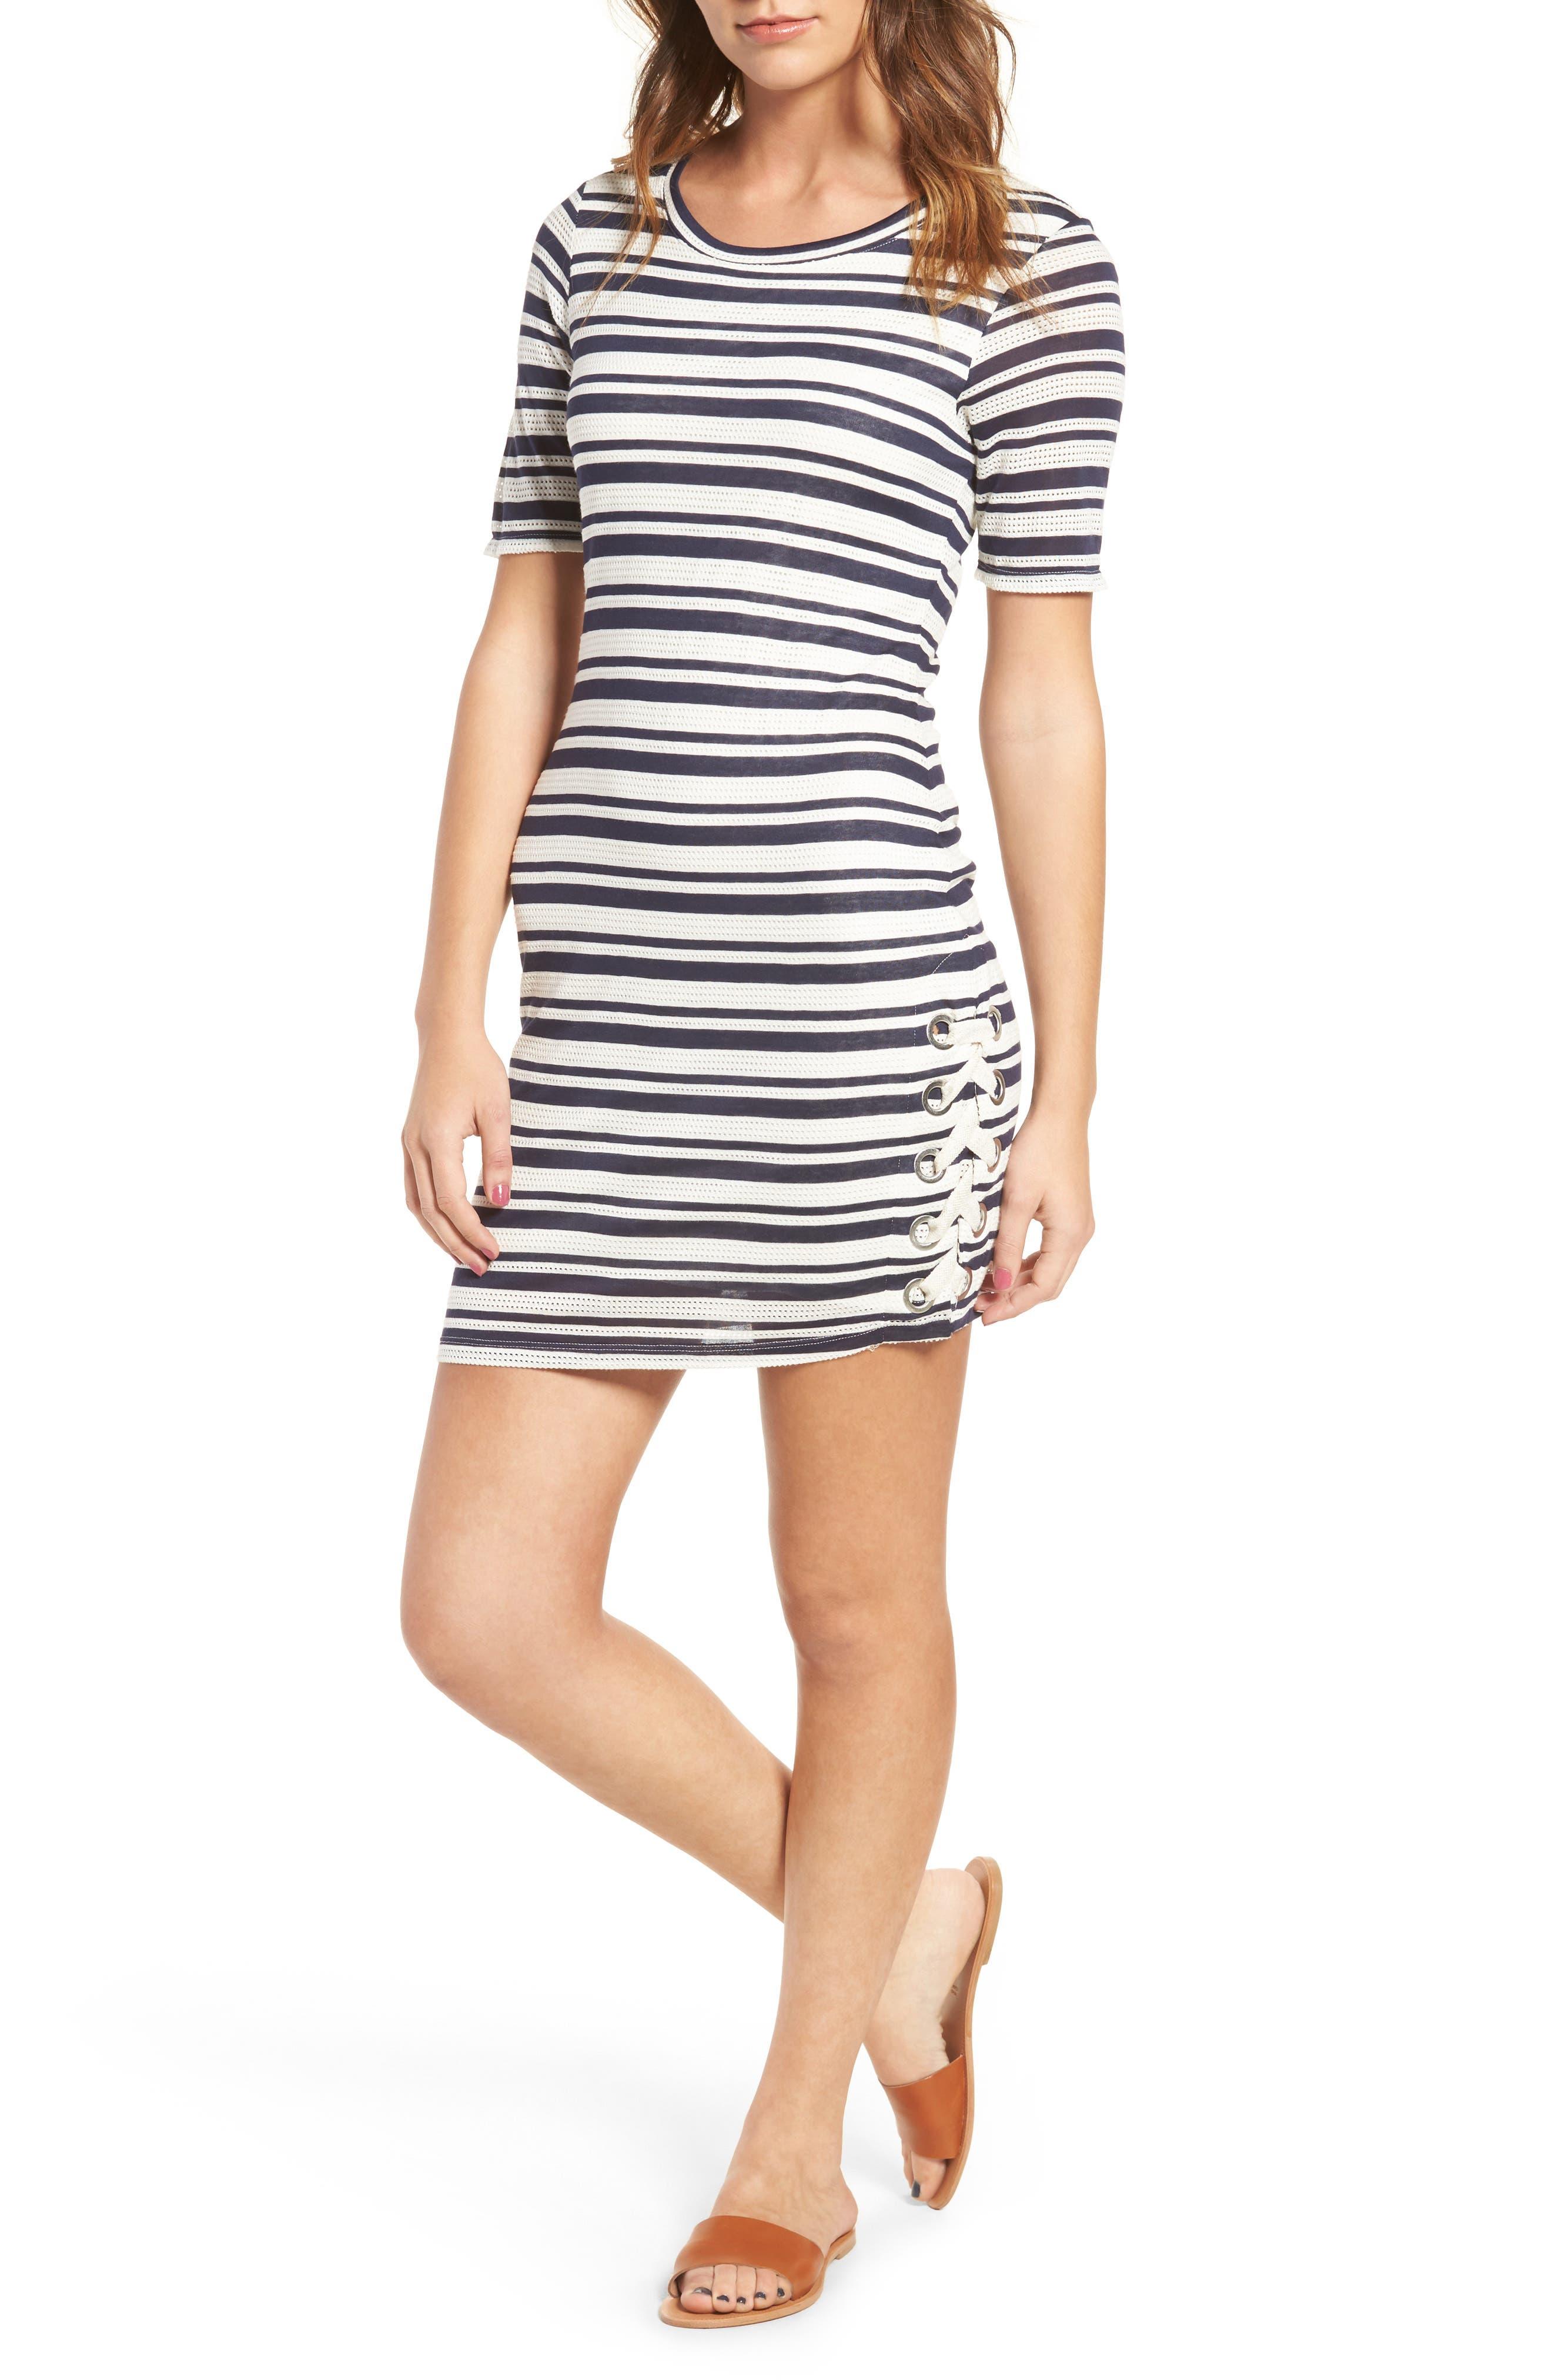 Alternate Image 1 Selected - Splendid Topsail Stripe Body-Con Dress